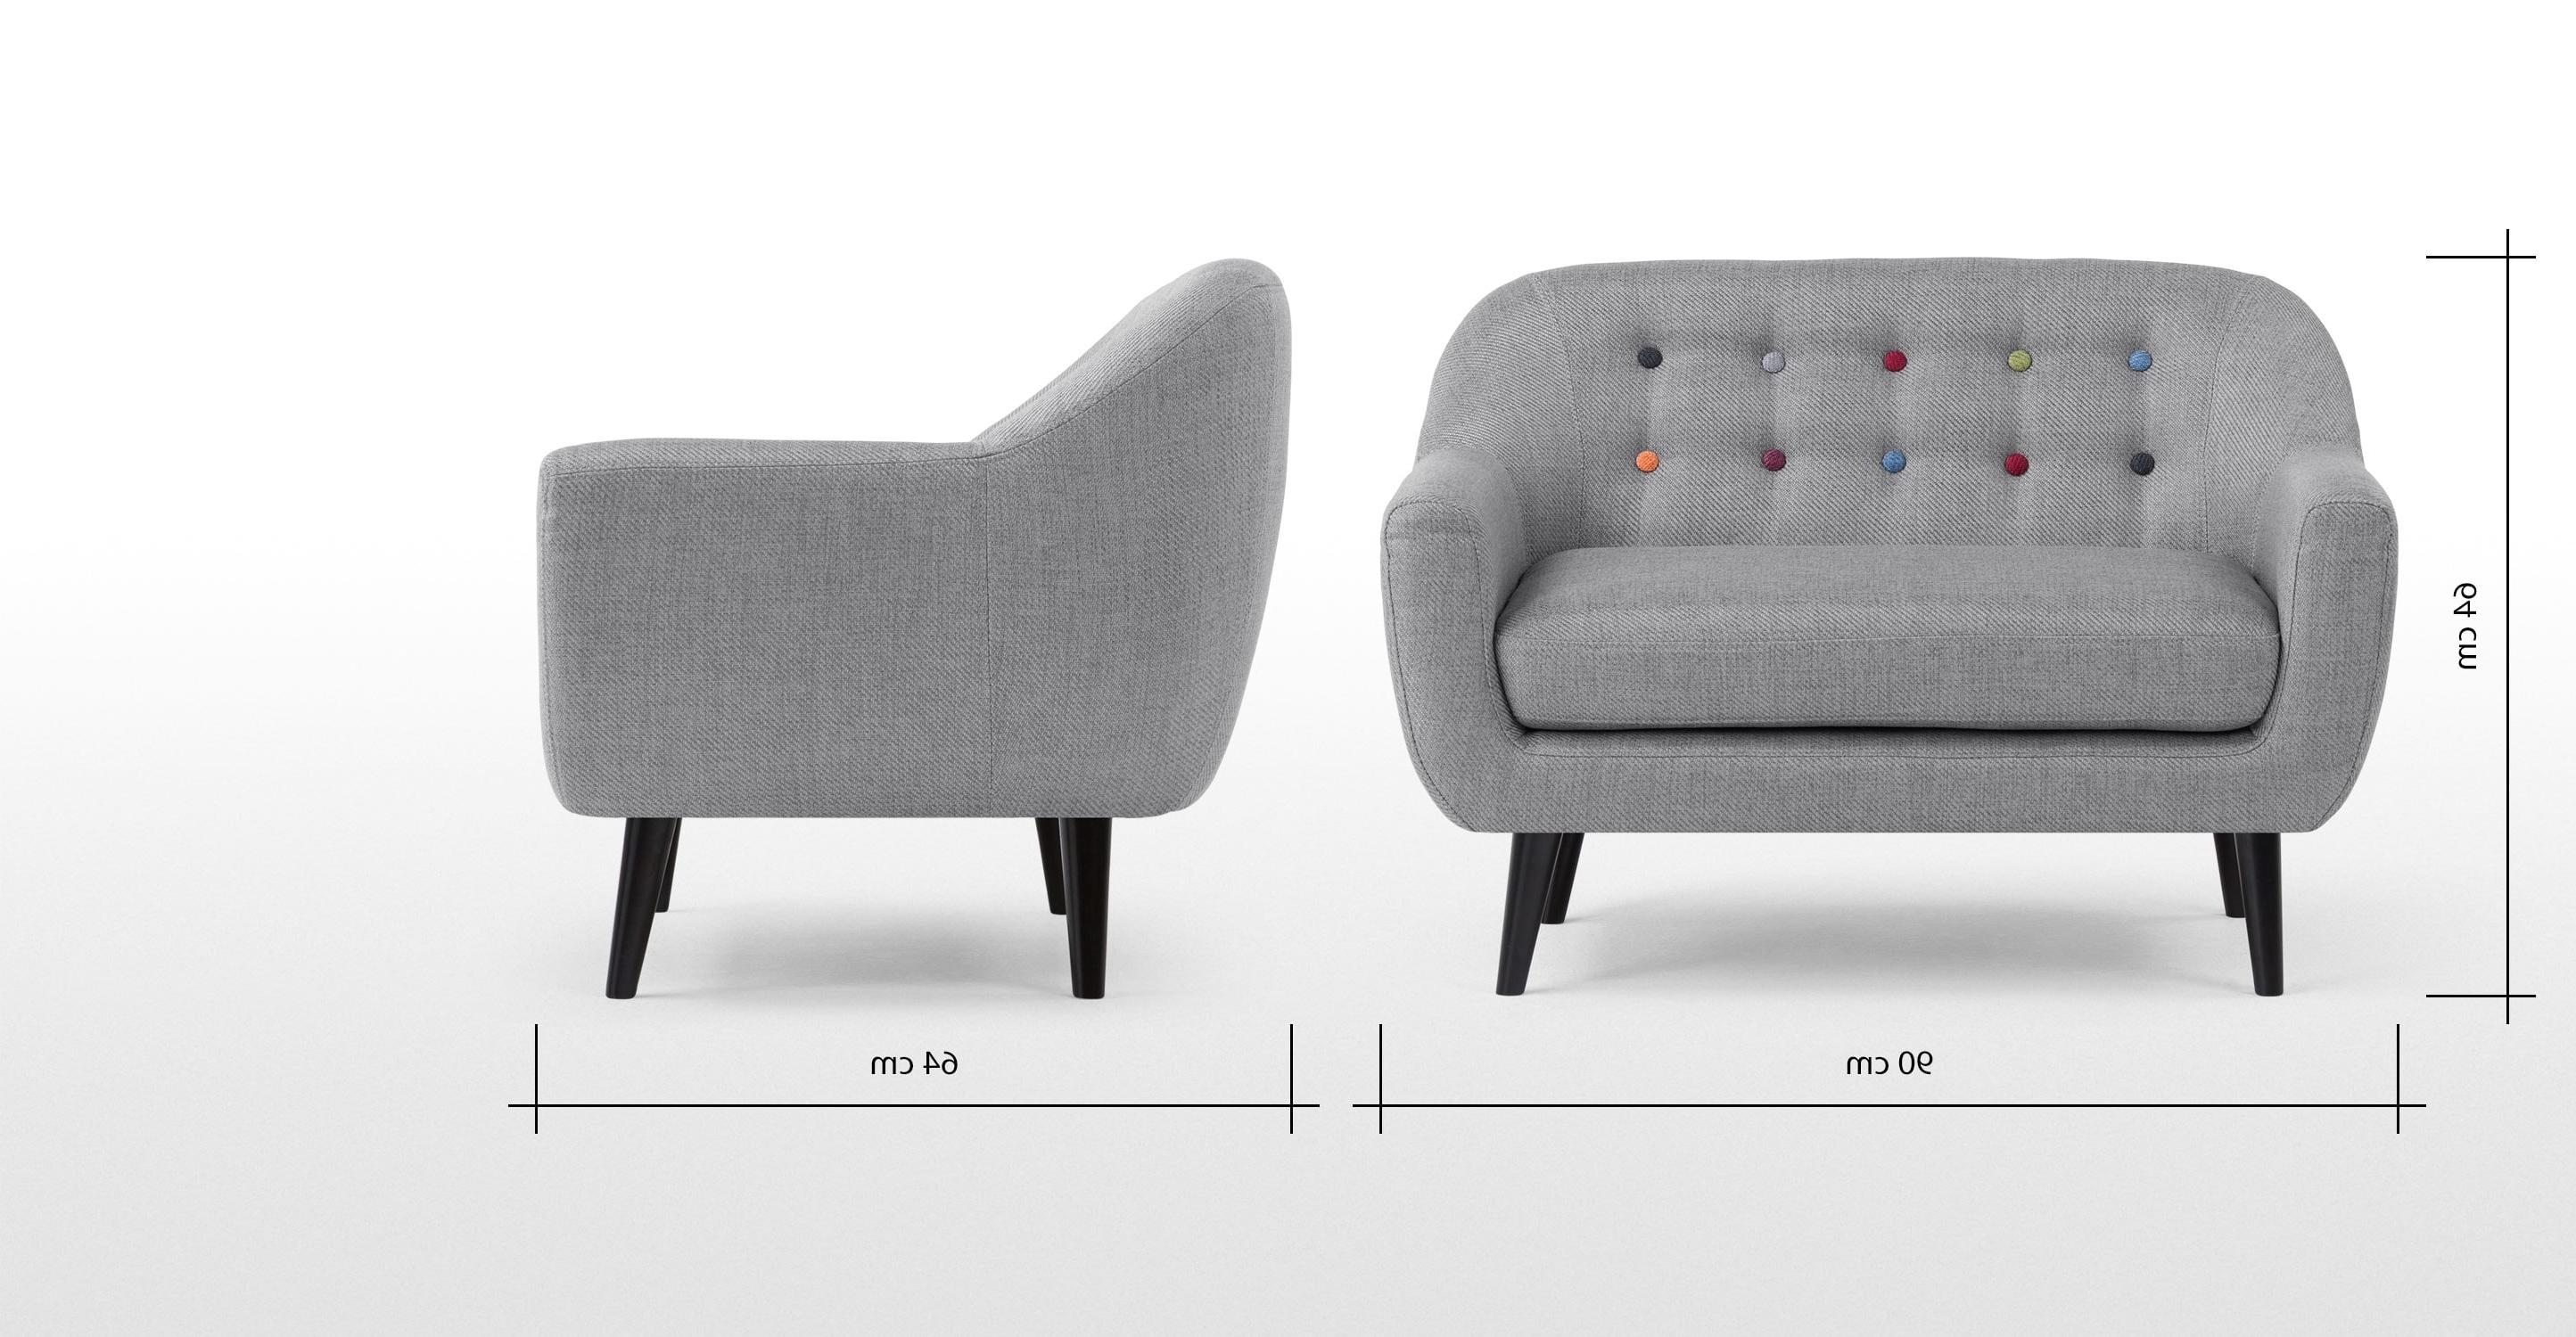 Mini Sofas Inside Well Known Awesome Mini Sofa 78 In Modern Sofa Ideas With Mini Sofa (View 6 of 15)